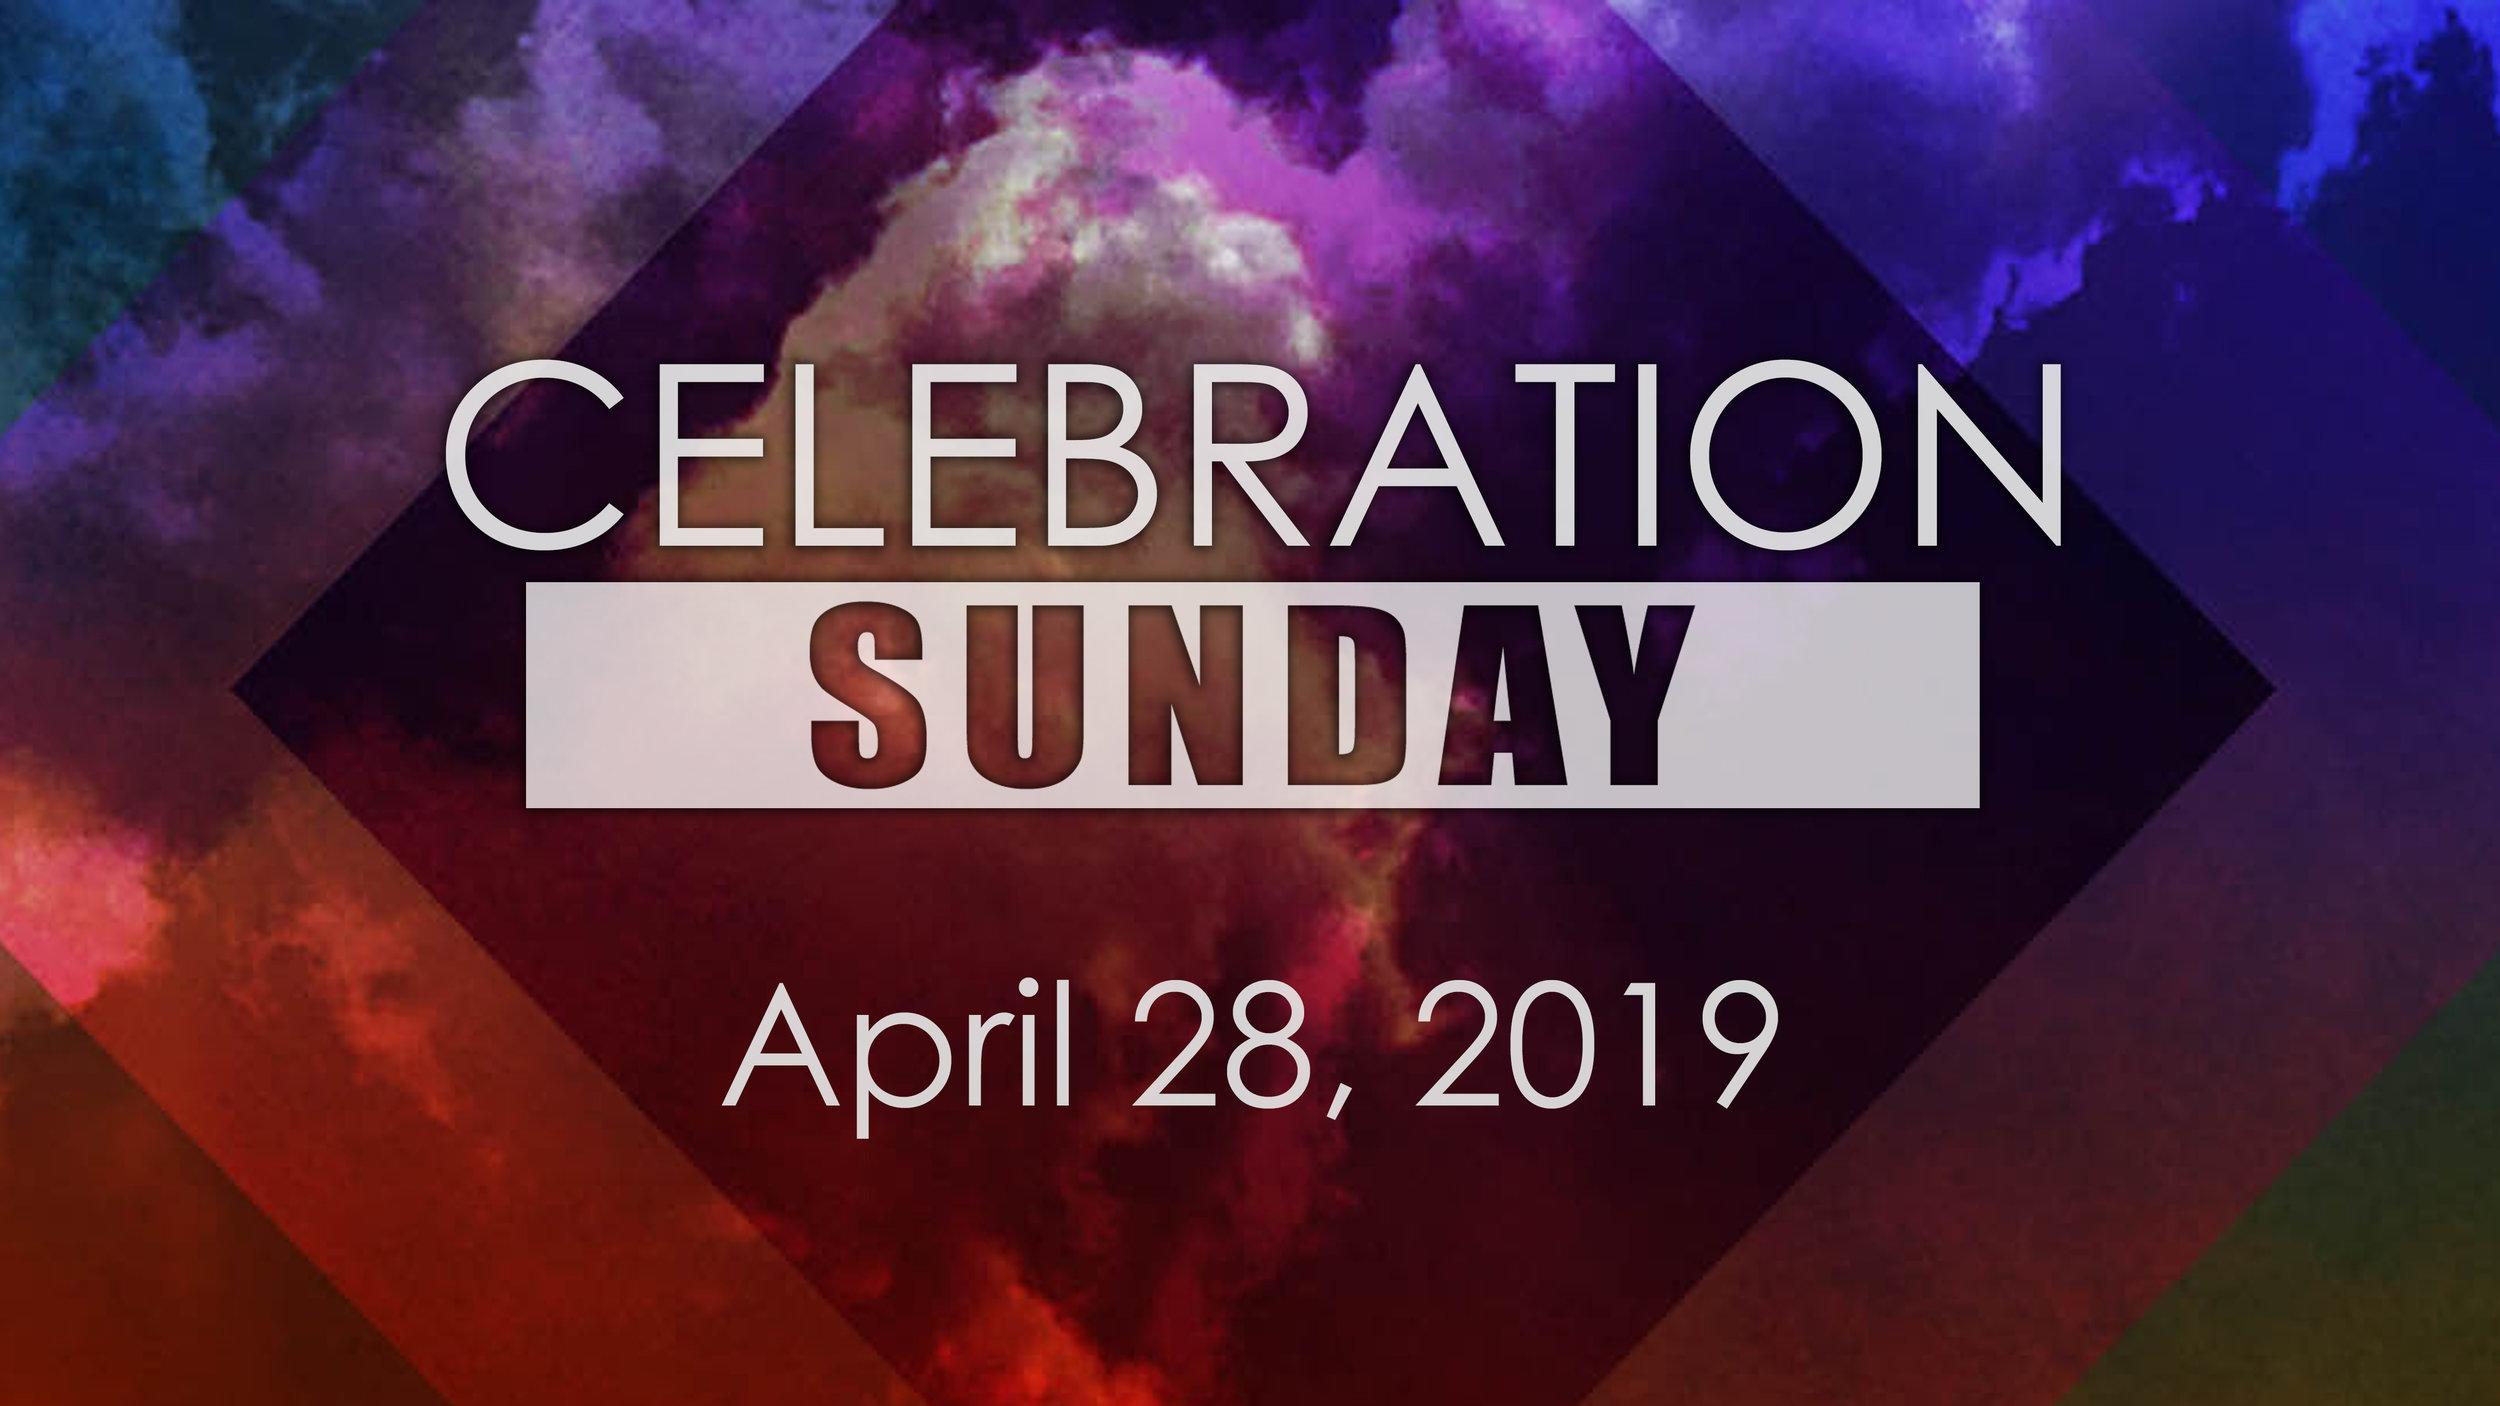 CelebrationSundayHD Apr28 2019.jpg